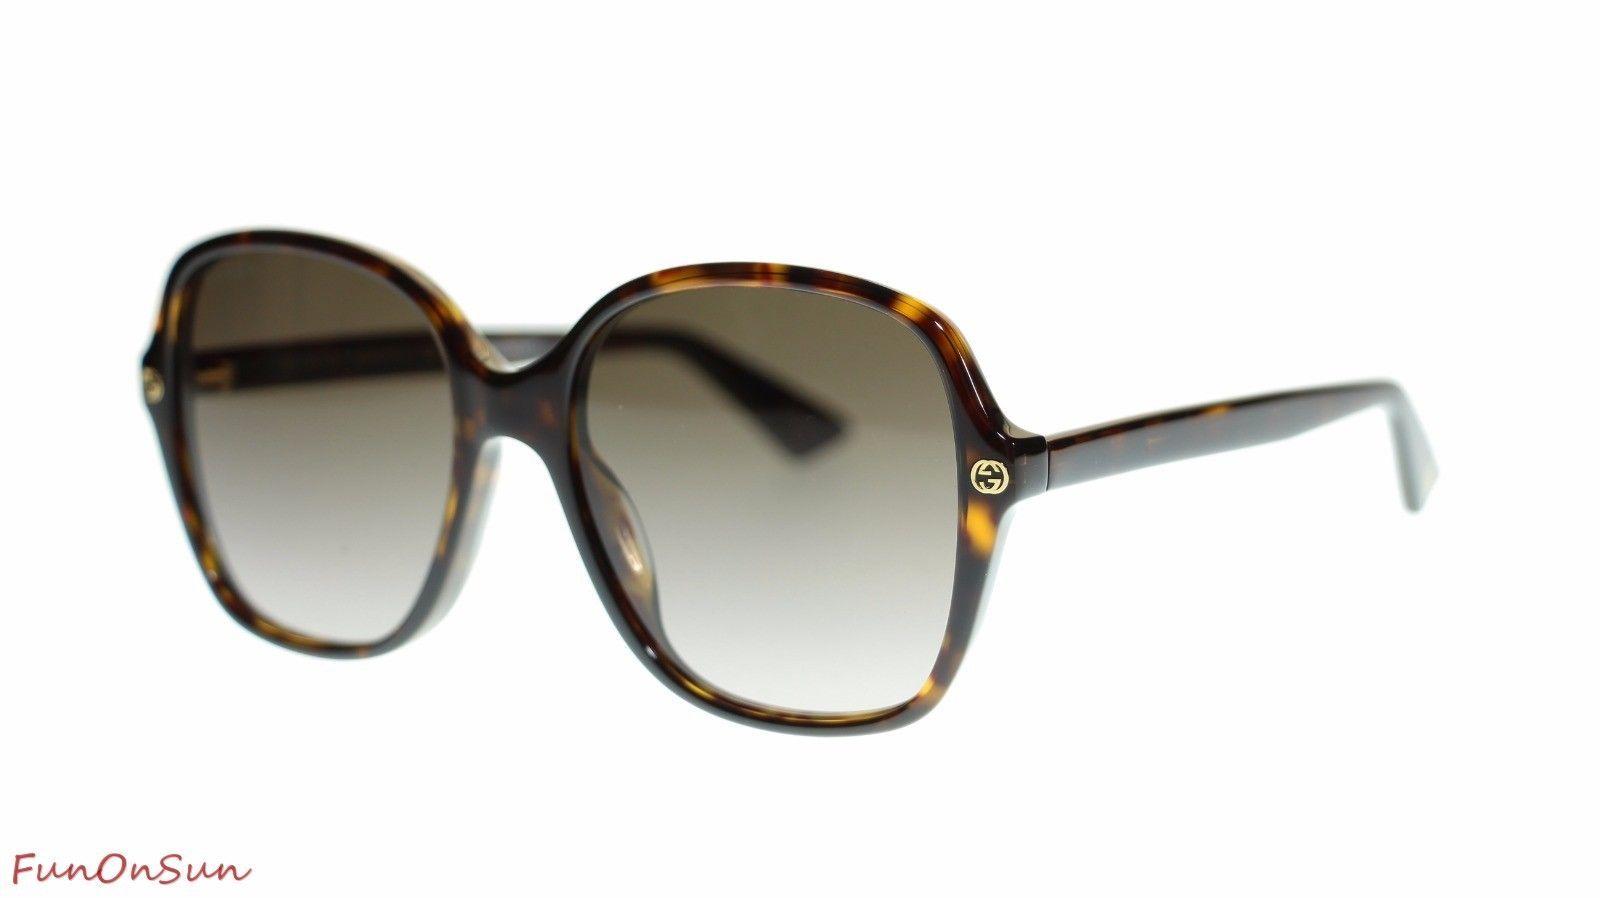 6431b055bb S l1600. S l1600. Previous. Gucci Women Square Sunglasses GG0092S 002 Havana  Brown Lens 55mm Authentic